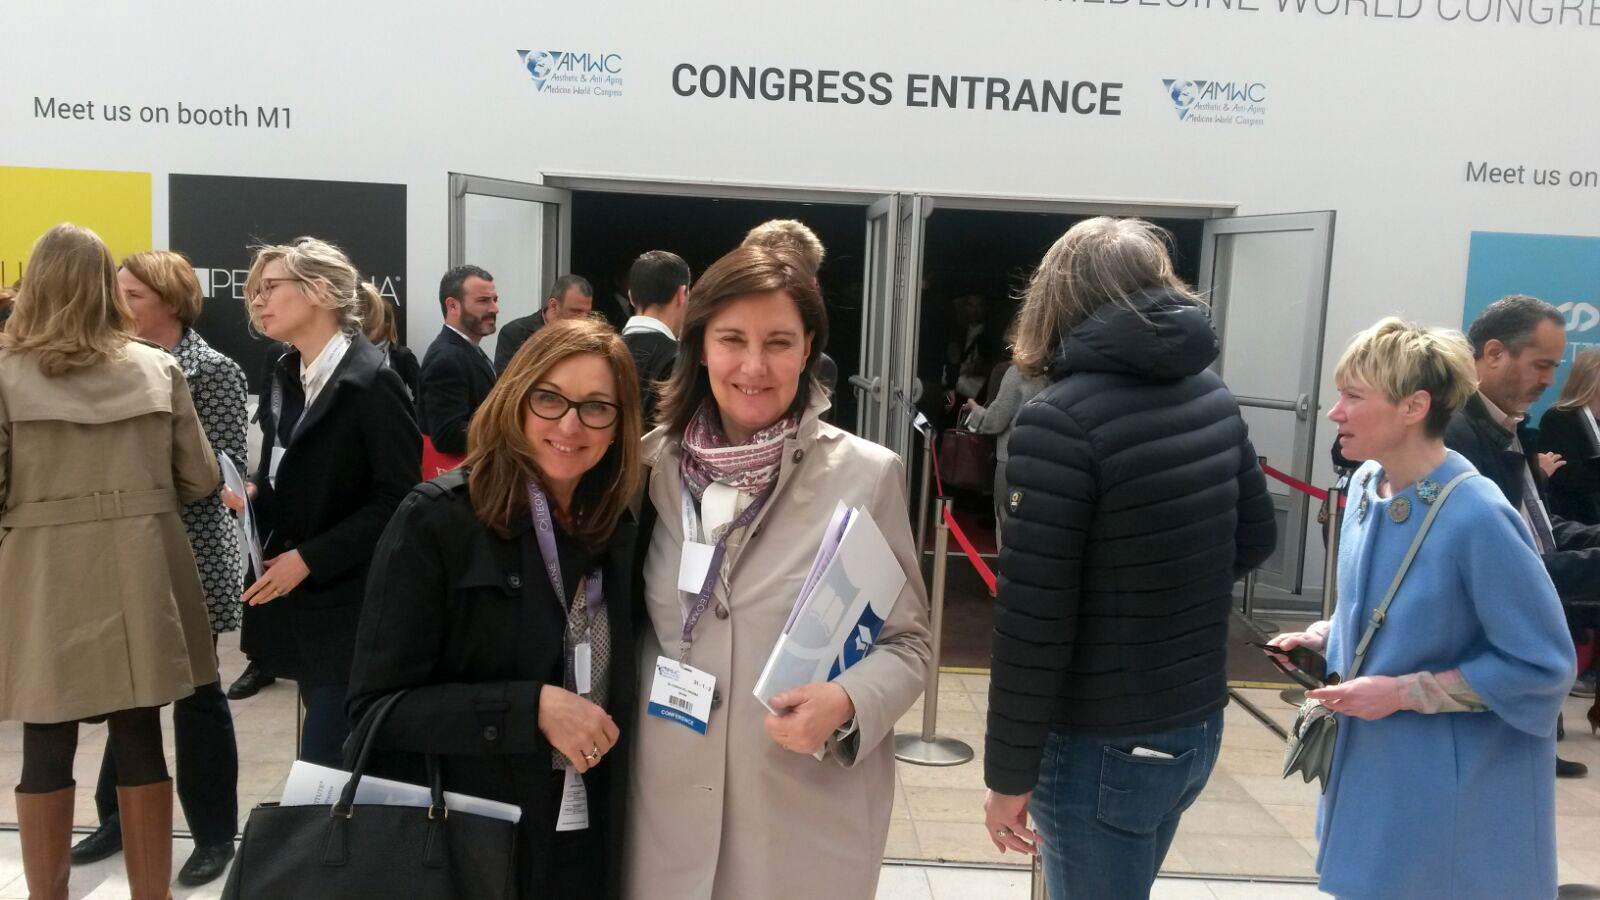 Congreso-en-Monaco-1-Dra-Villanueva-con-la-Dra-Escoda